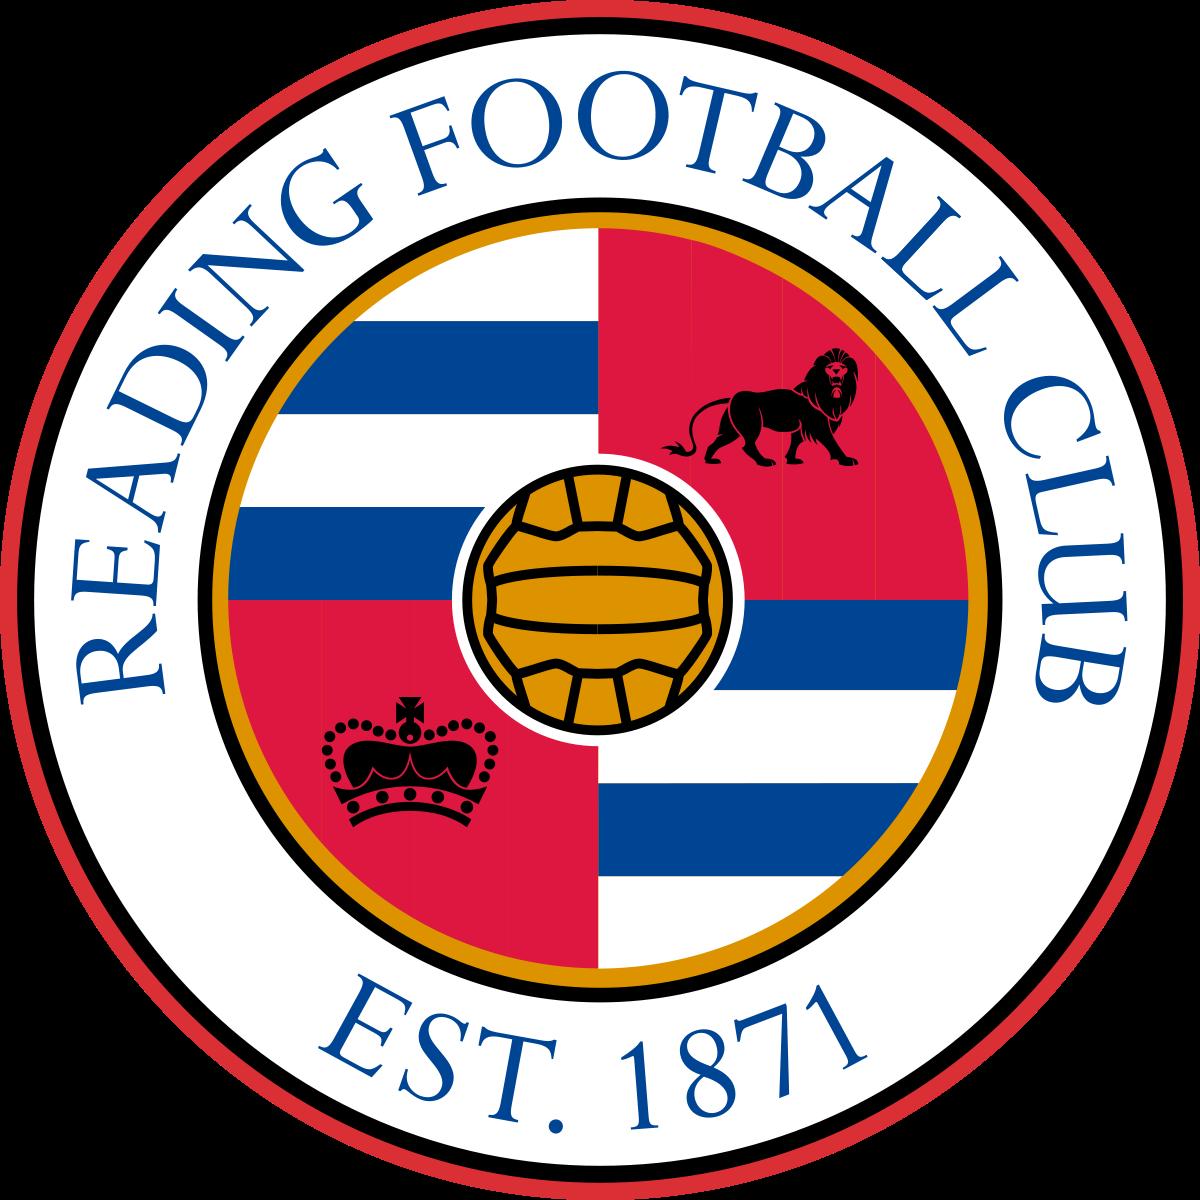 Рединг U23 - Logo